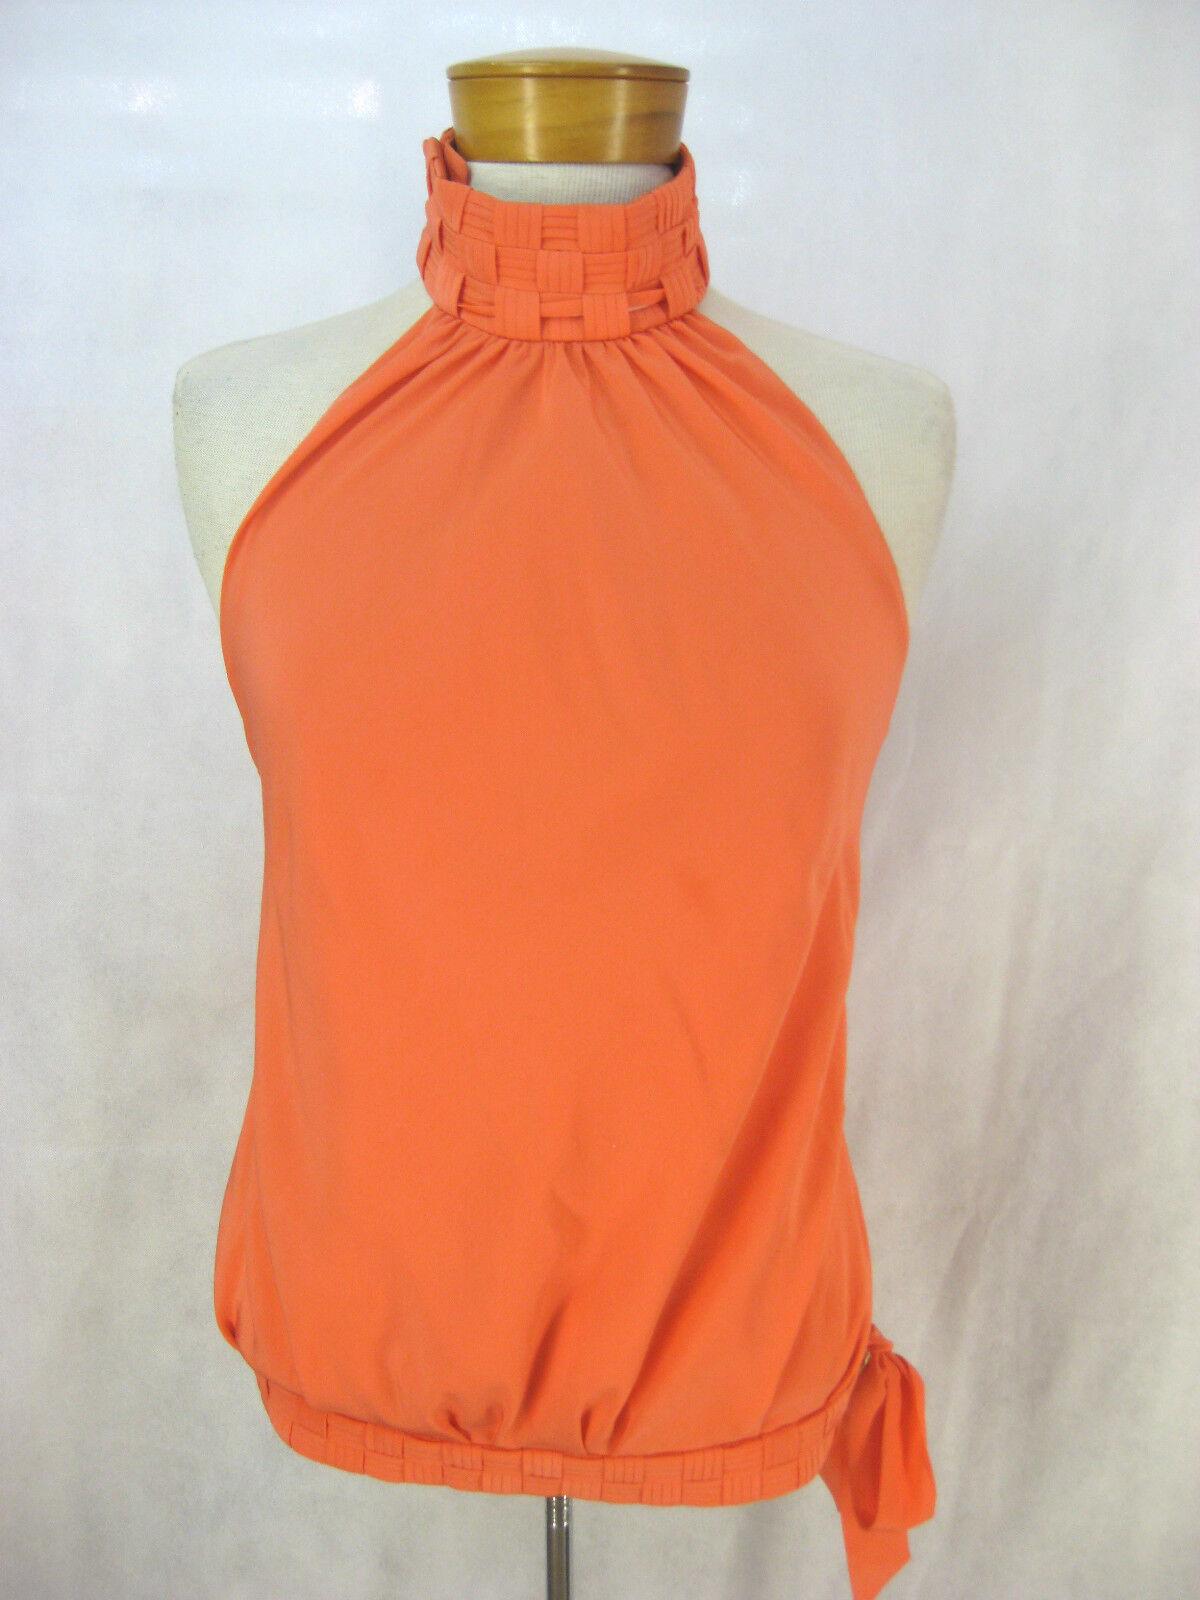 Rohmir Größe 8, 10, 38  designer coral colourot silk top with woven neckline